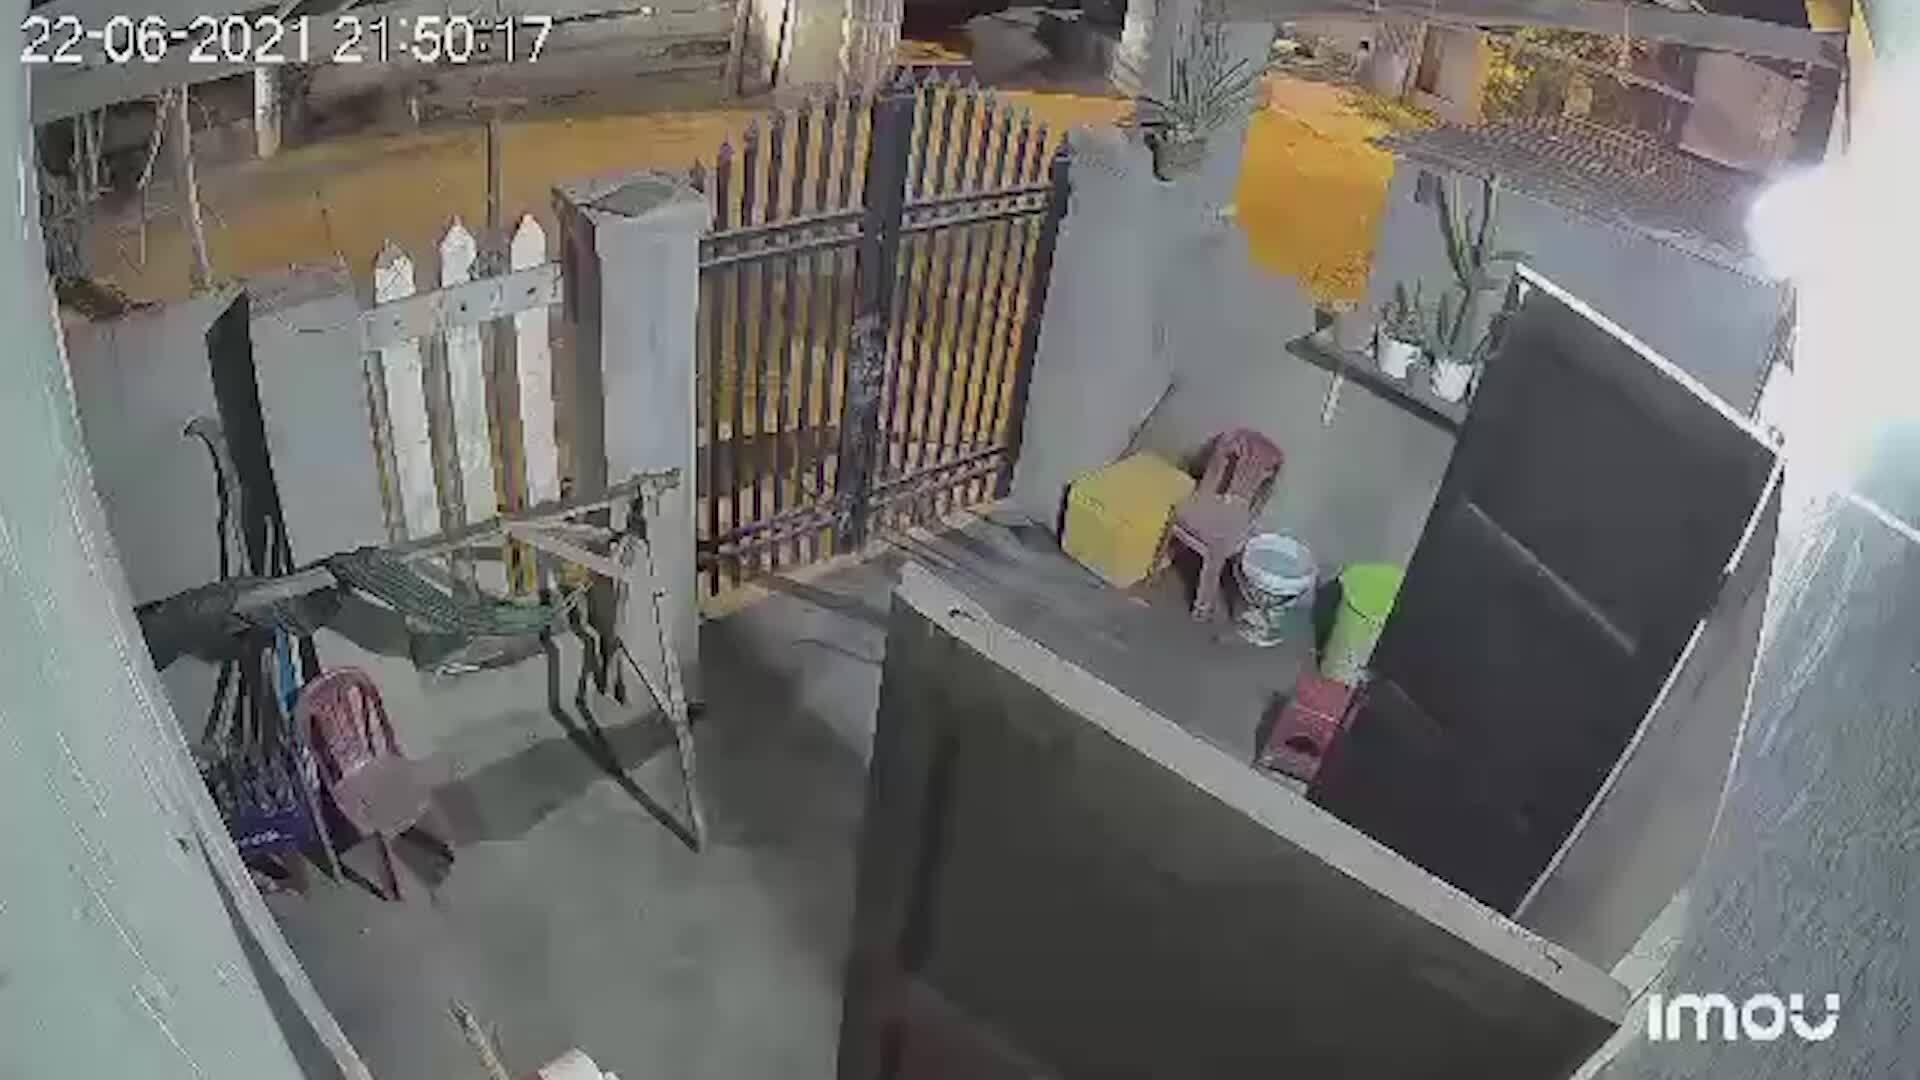 video minh họa